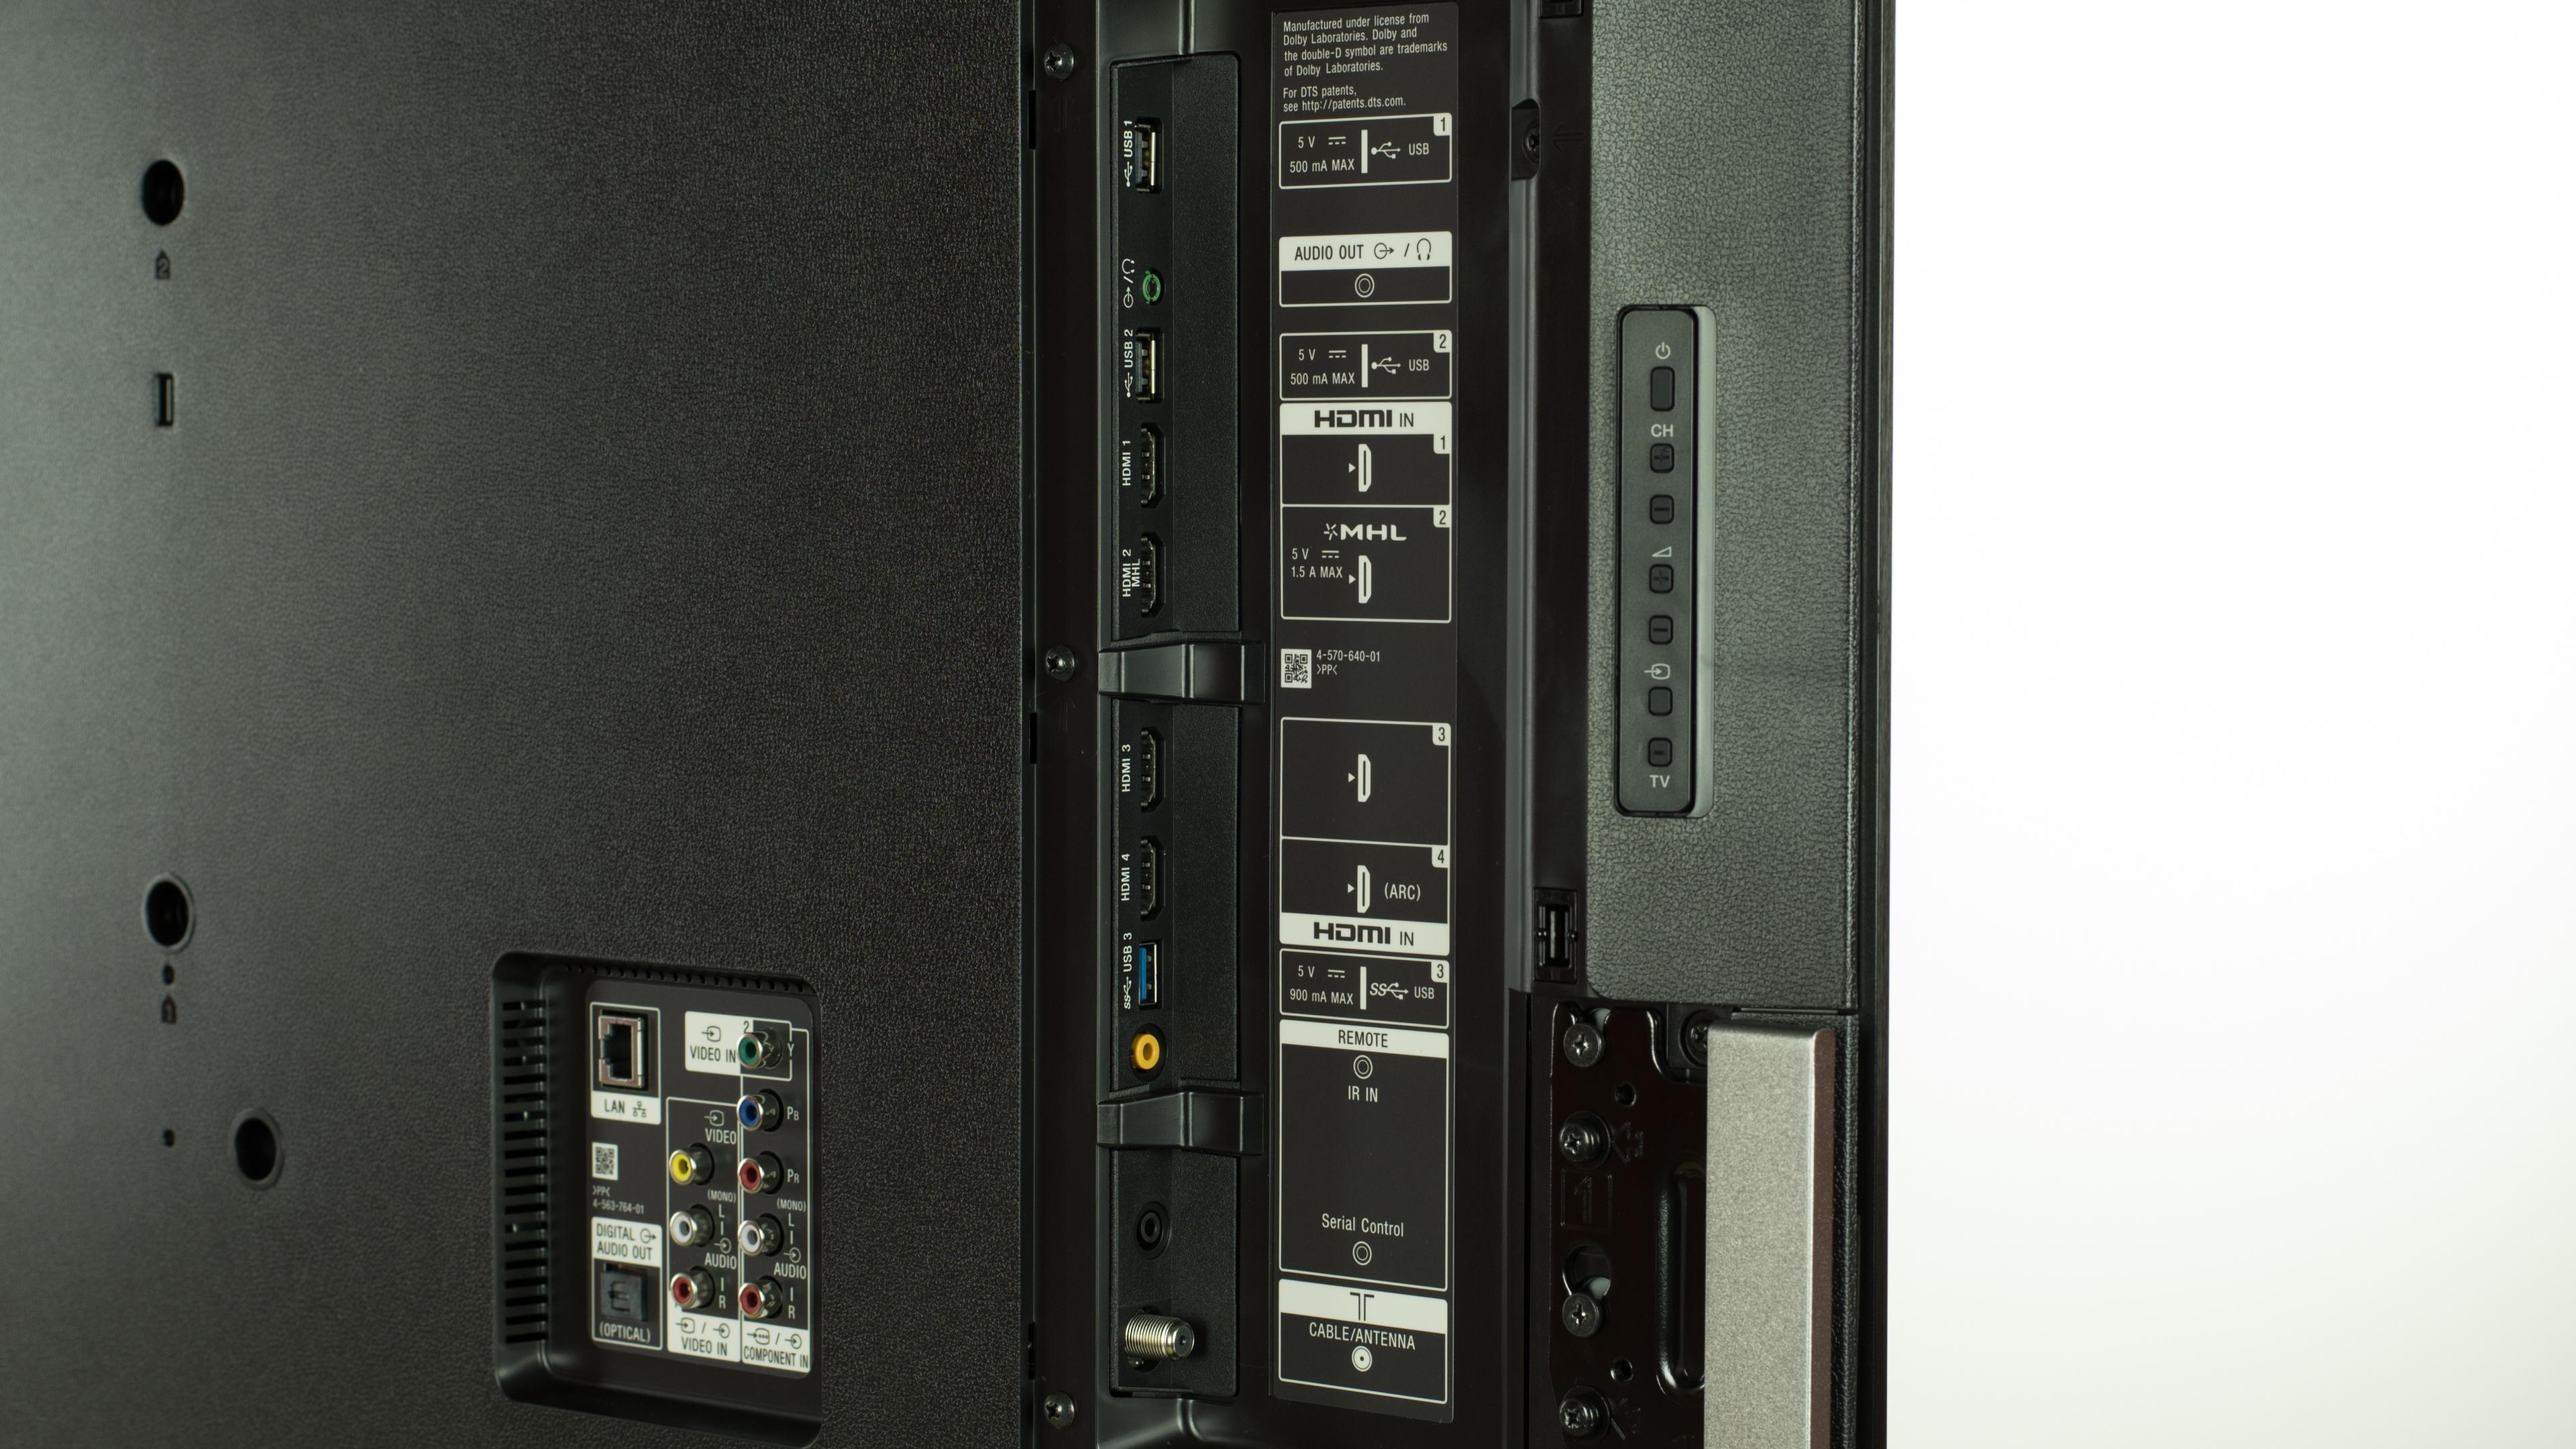 Sony X900c Review Xbr55x900c Xbr65x900c Rtings Com